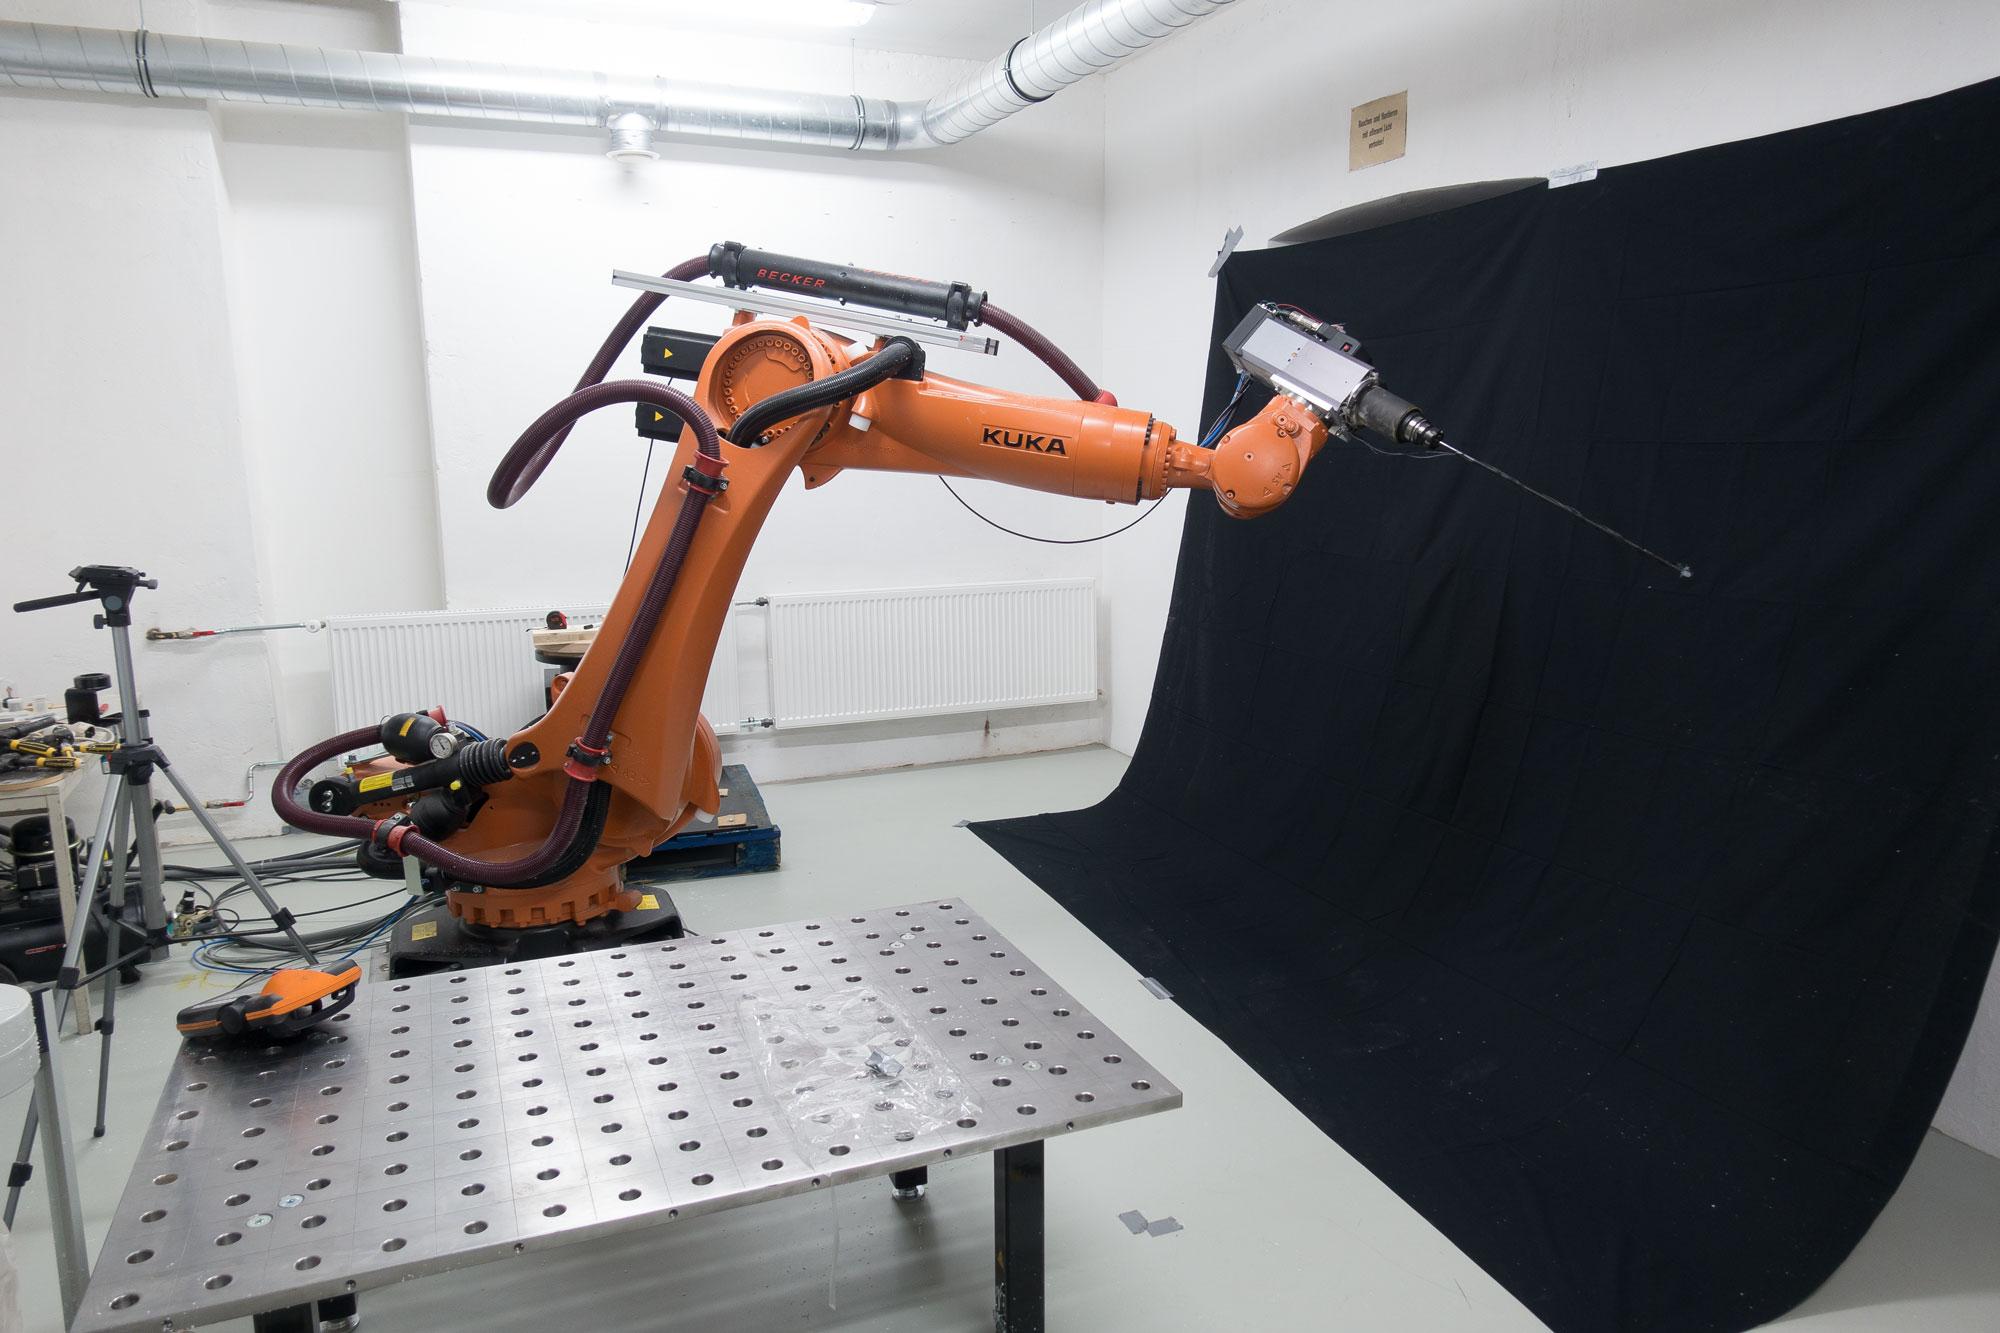 KUKA ROBOT WIP